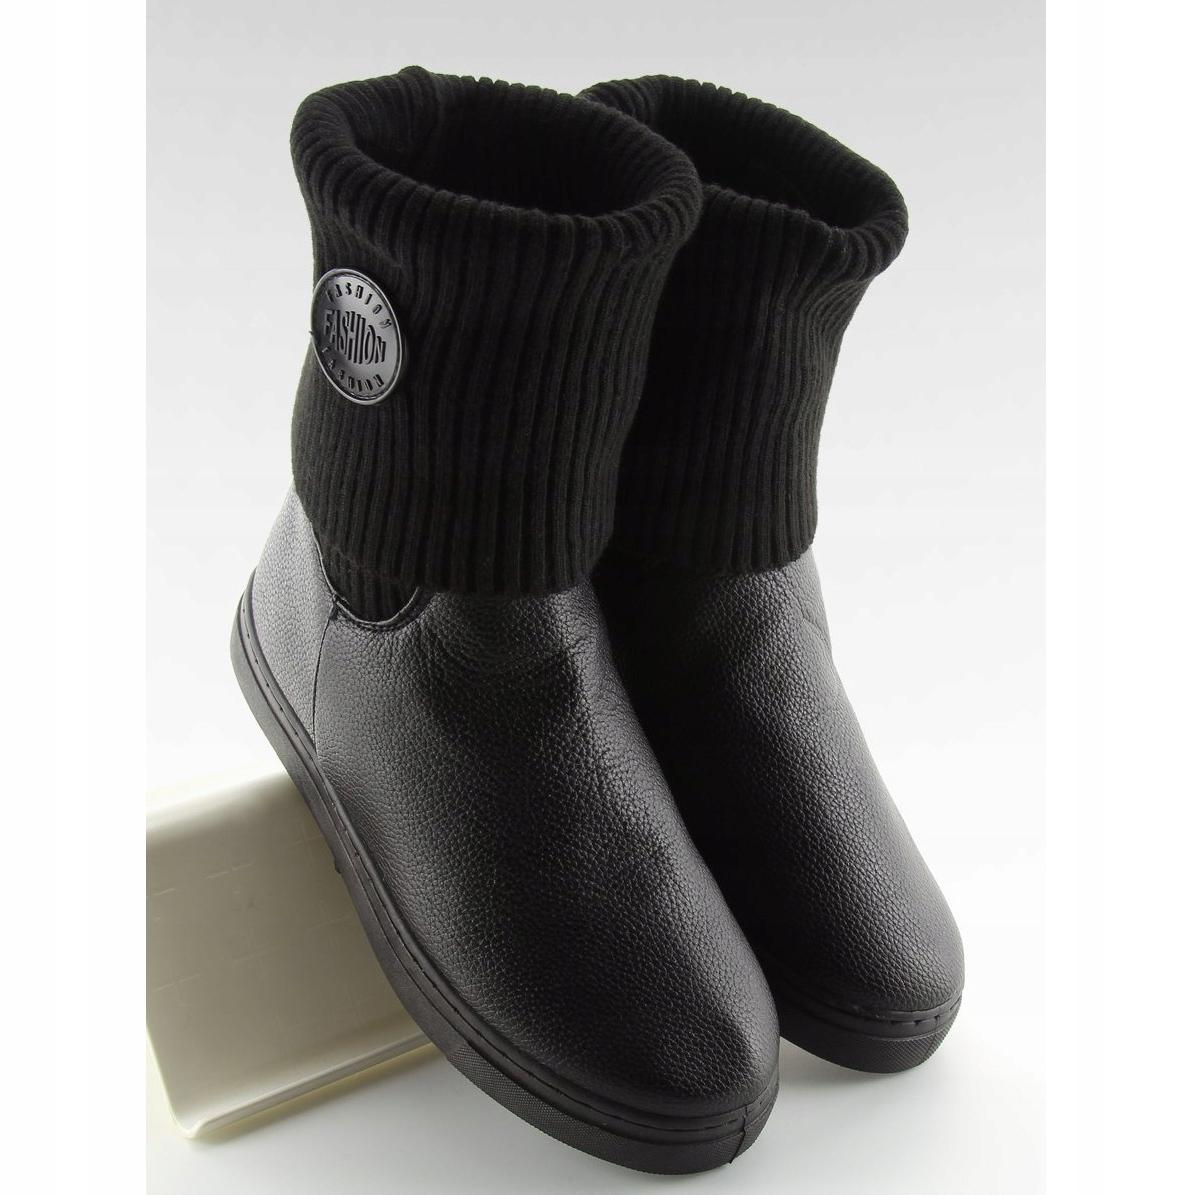 botines-con-parte-superior-de-lana-negro-nb30-negro miniatura 5